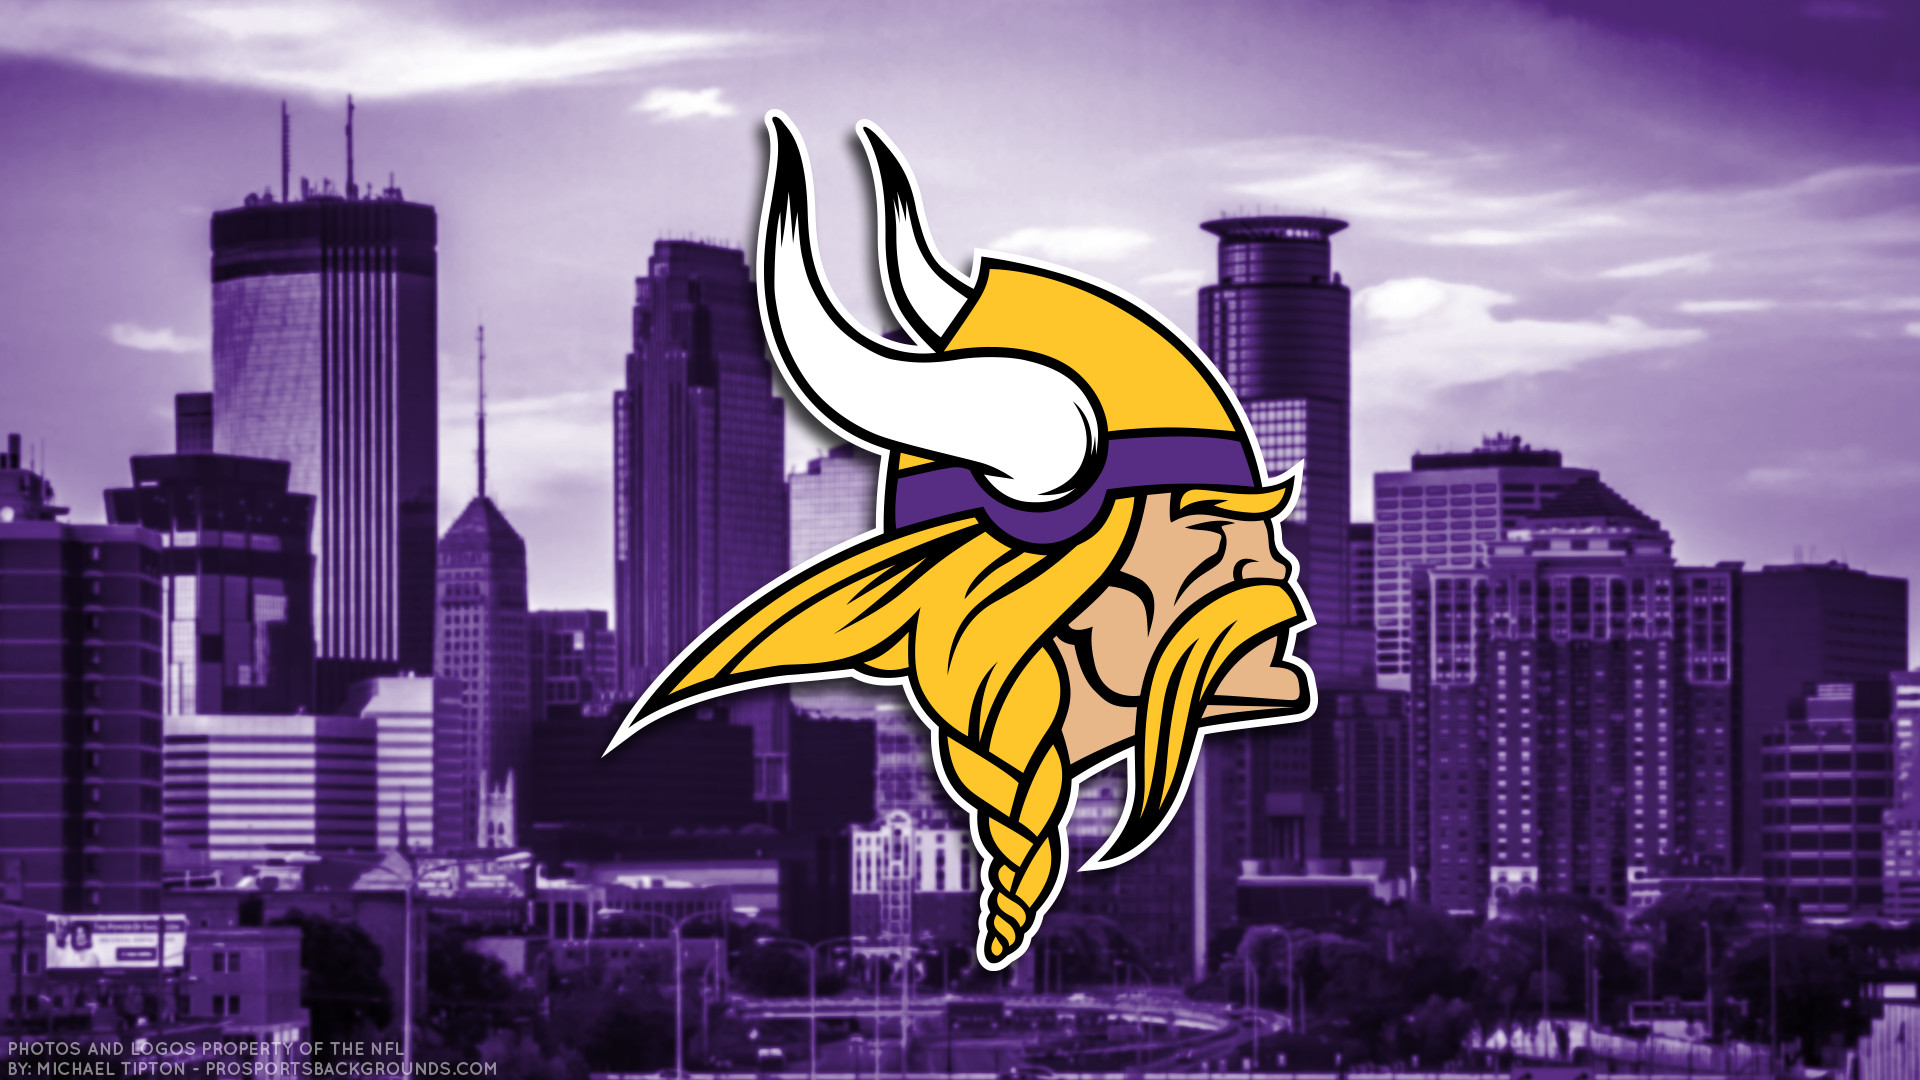 … Minnesota Vikings 2017 football logo wallpaper pc desktop computer …